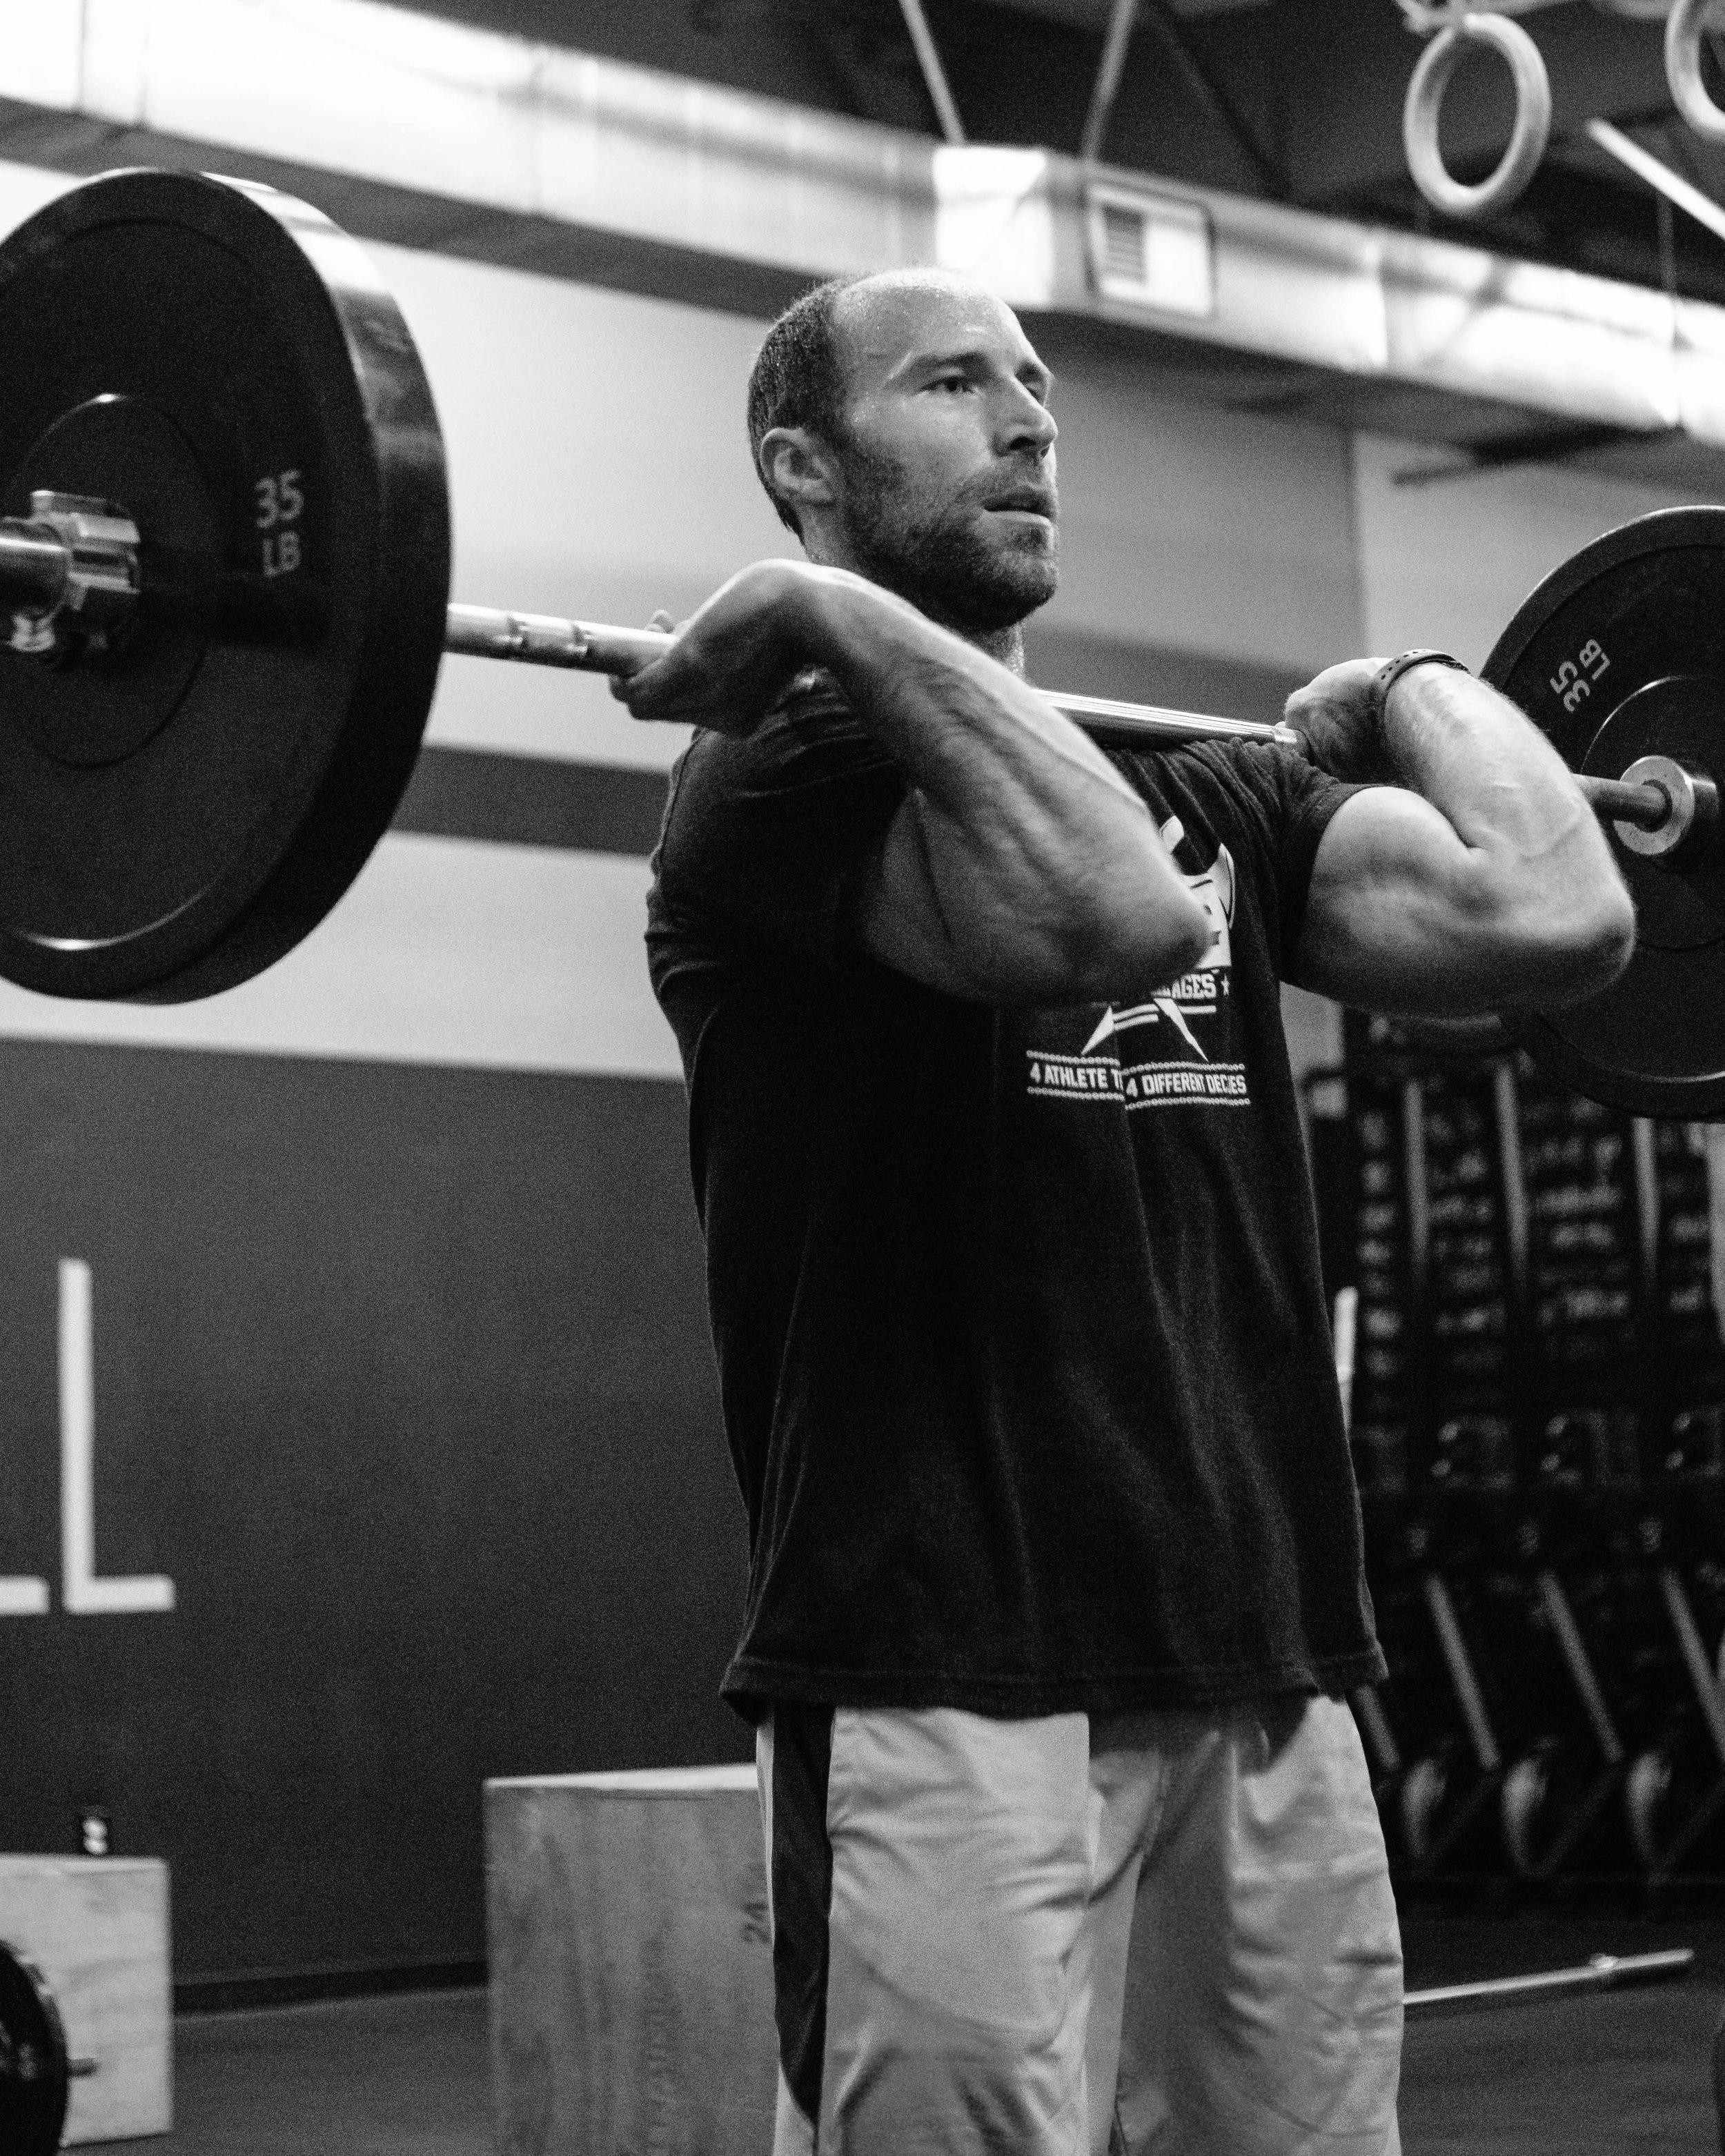 Eric Powell, DPT - CoachCrossFit L1